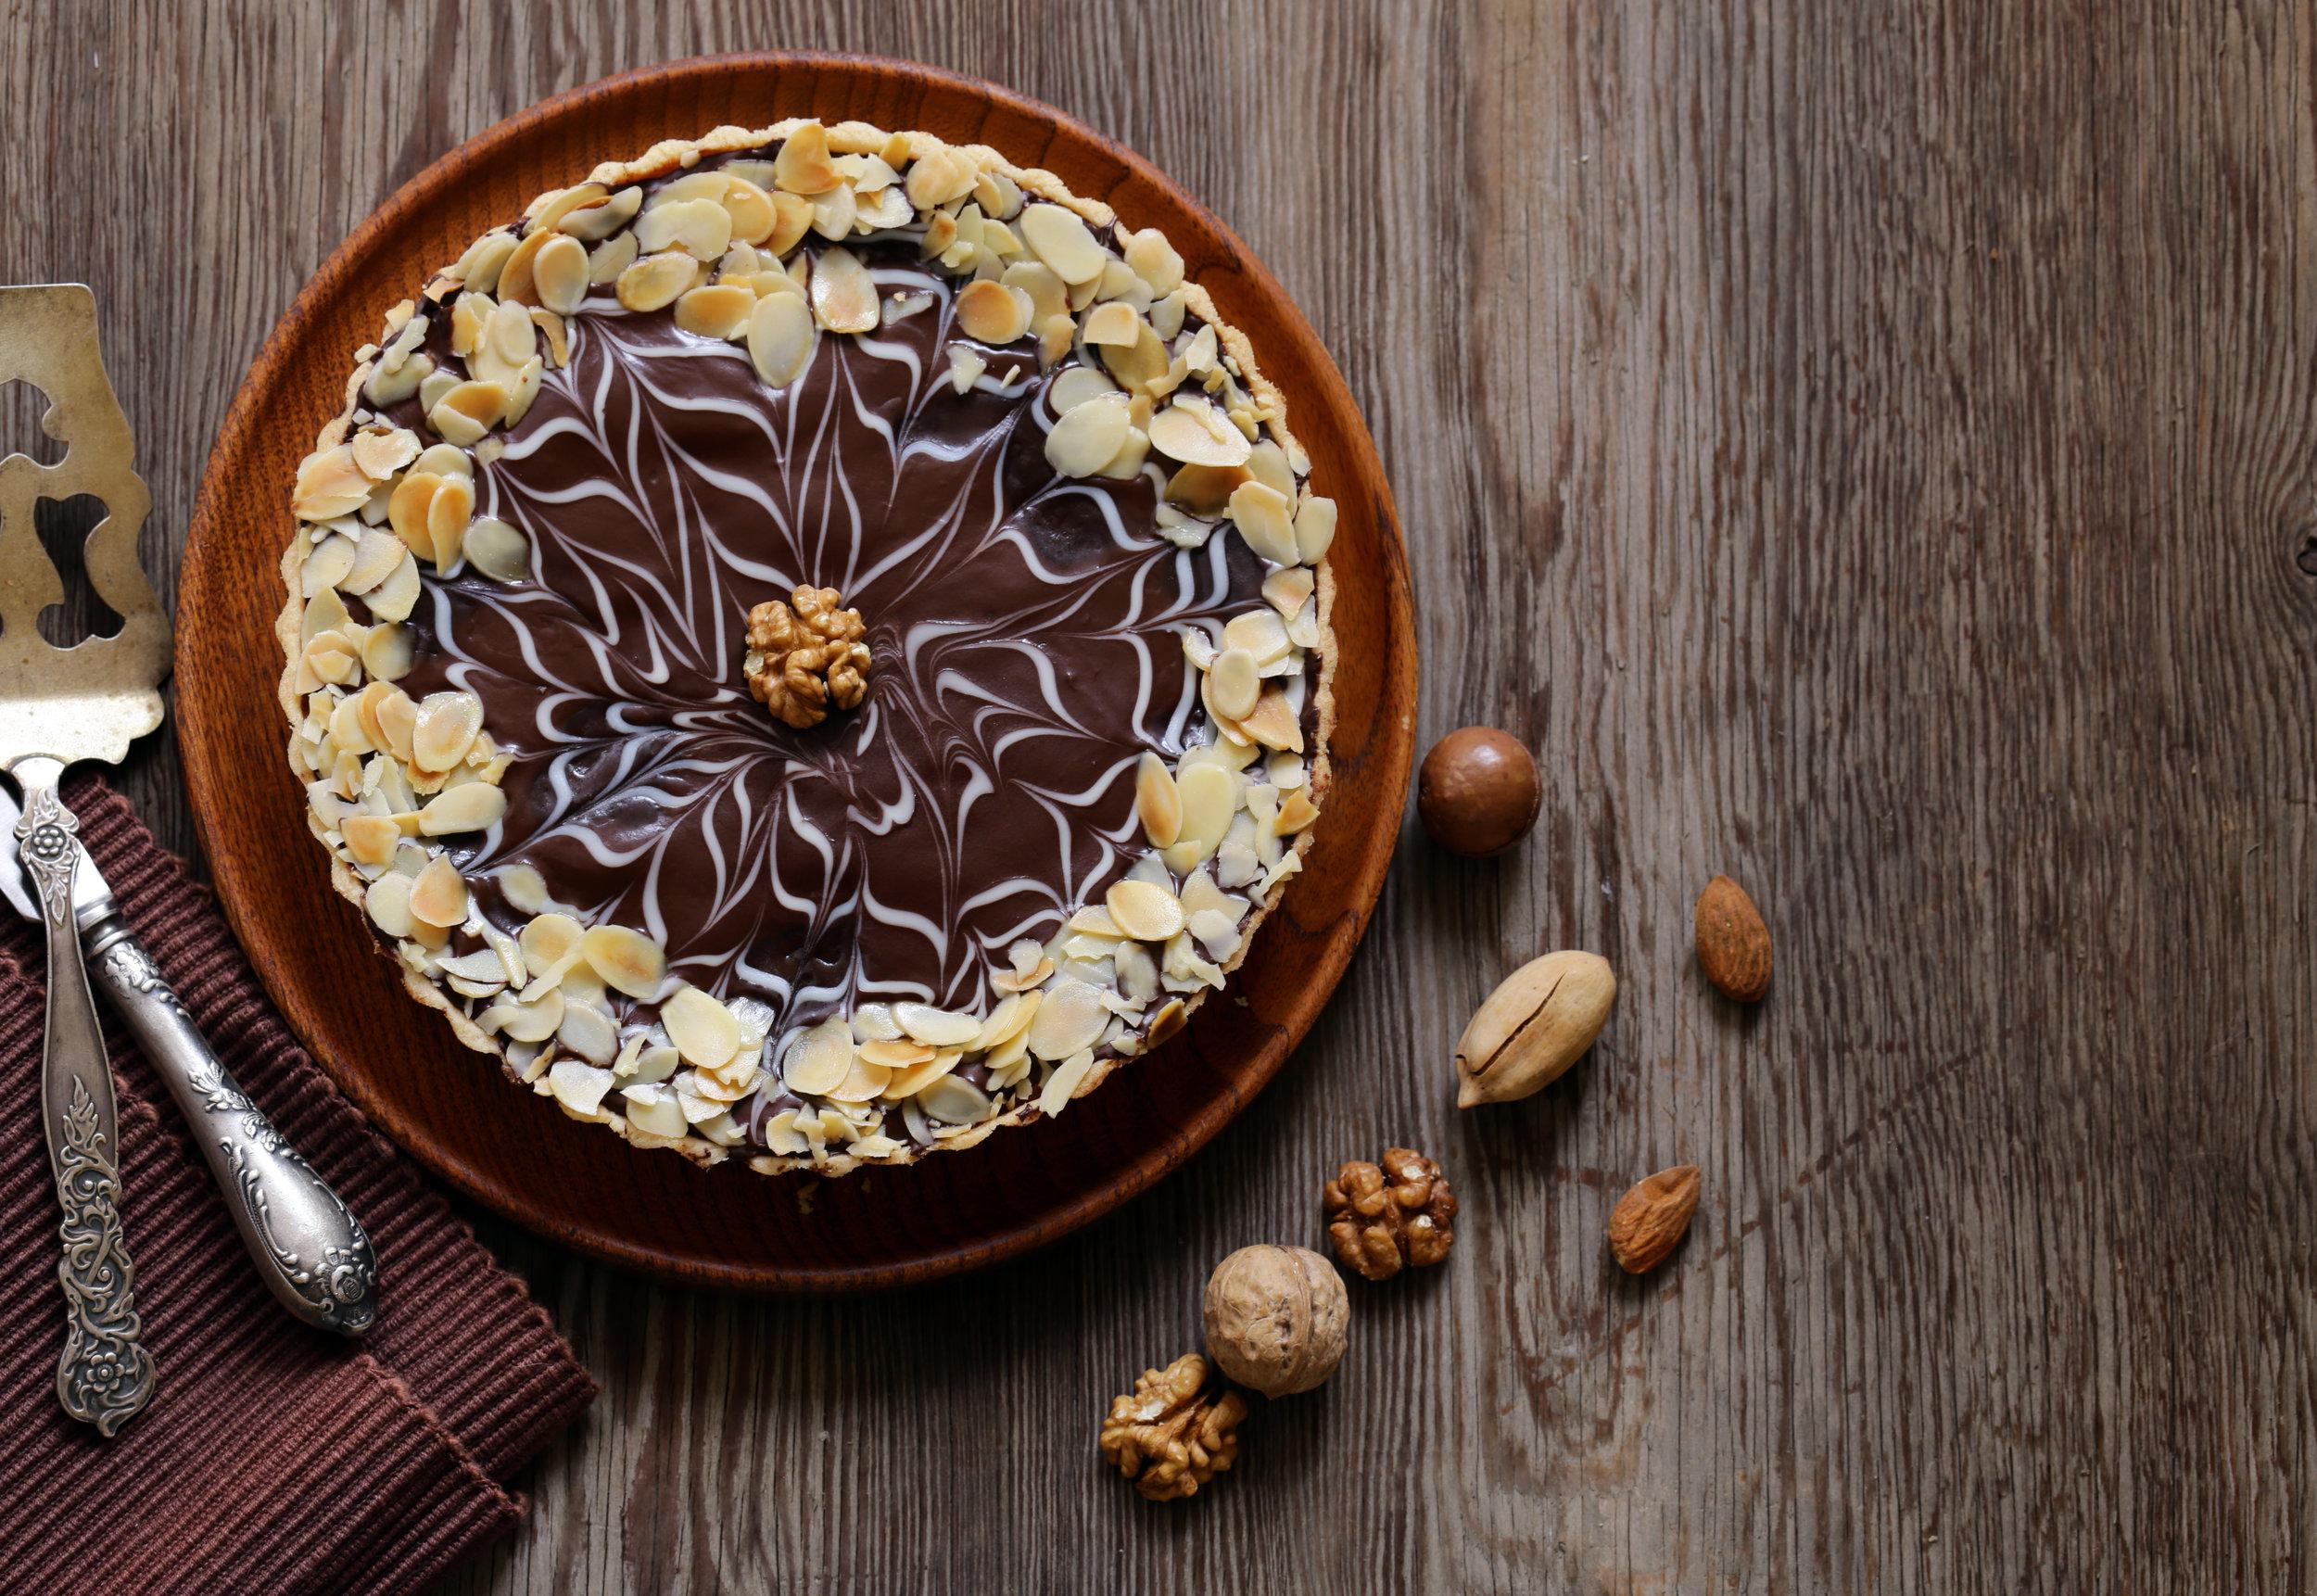 cake-with-nuts-and-chocolate-LX5FVNE.jpg